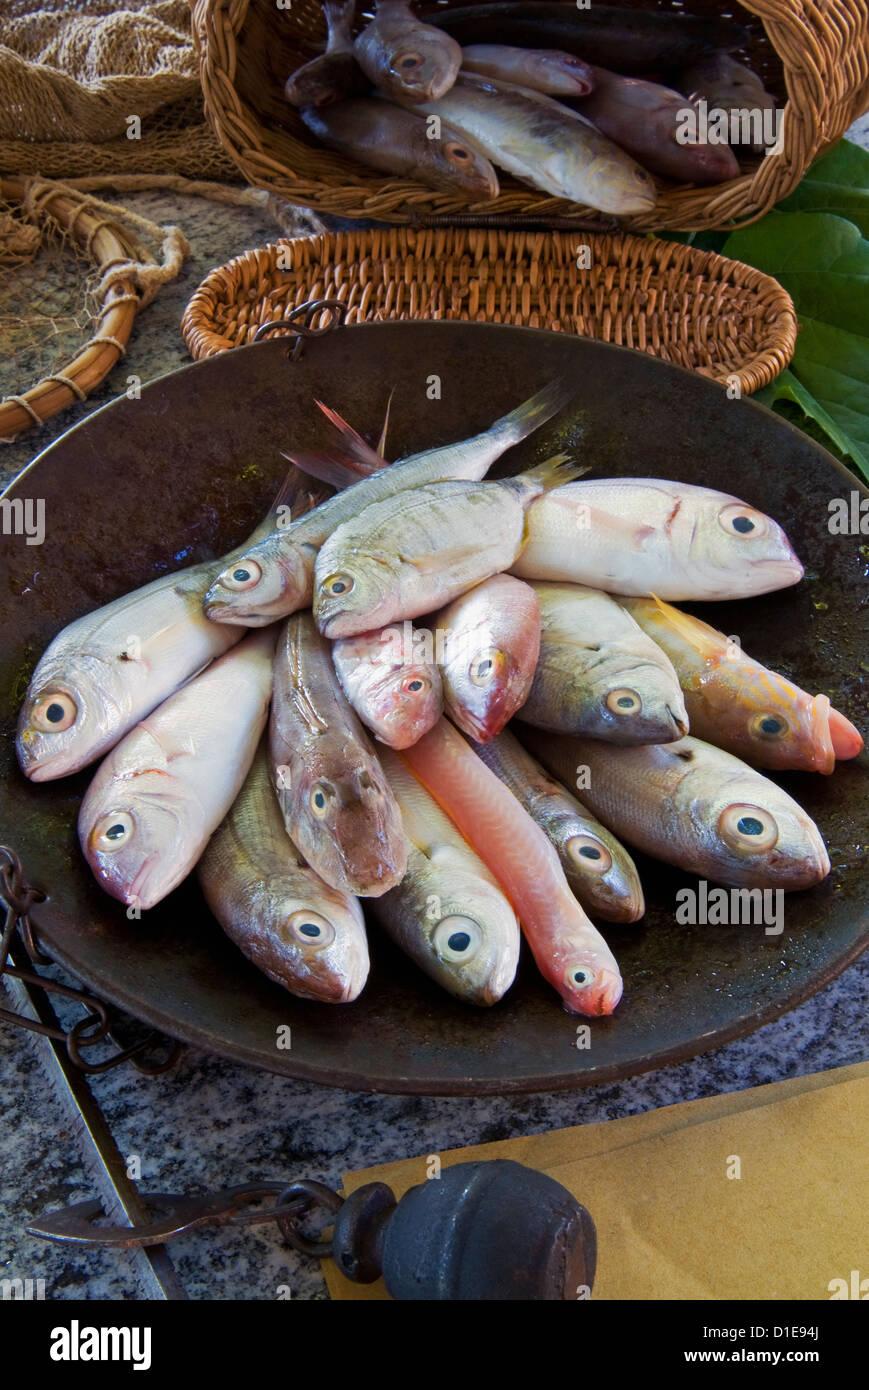 Équilibre Steelyard contenant du poisson méditerranéen, dorade, Grondin, comber et bandfish rouge, Photo Stock